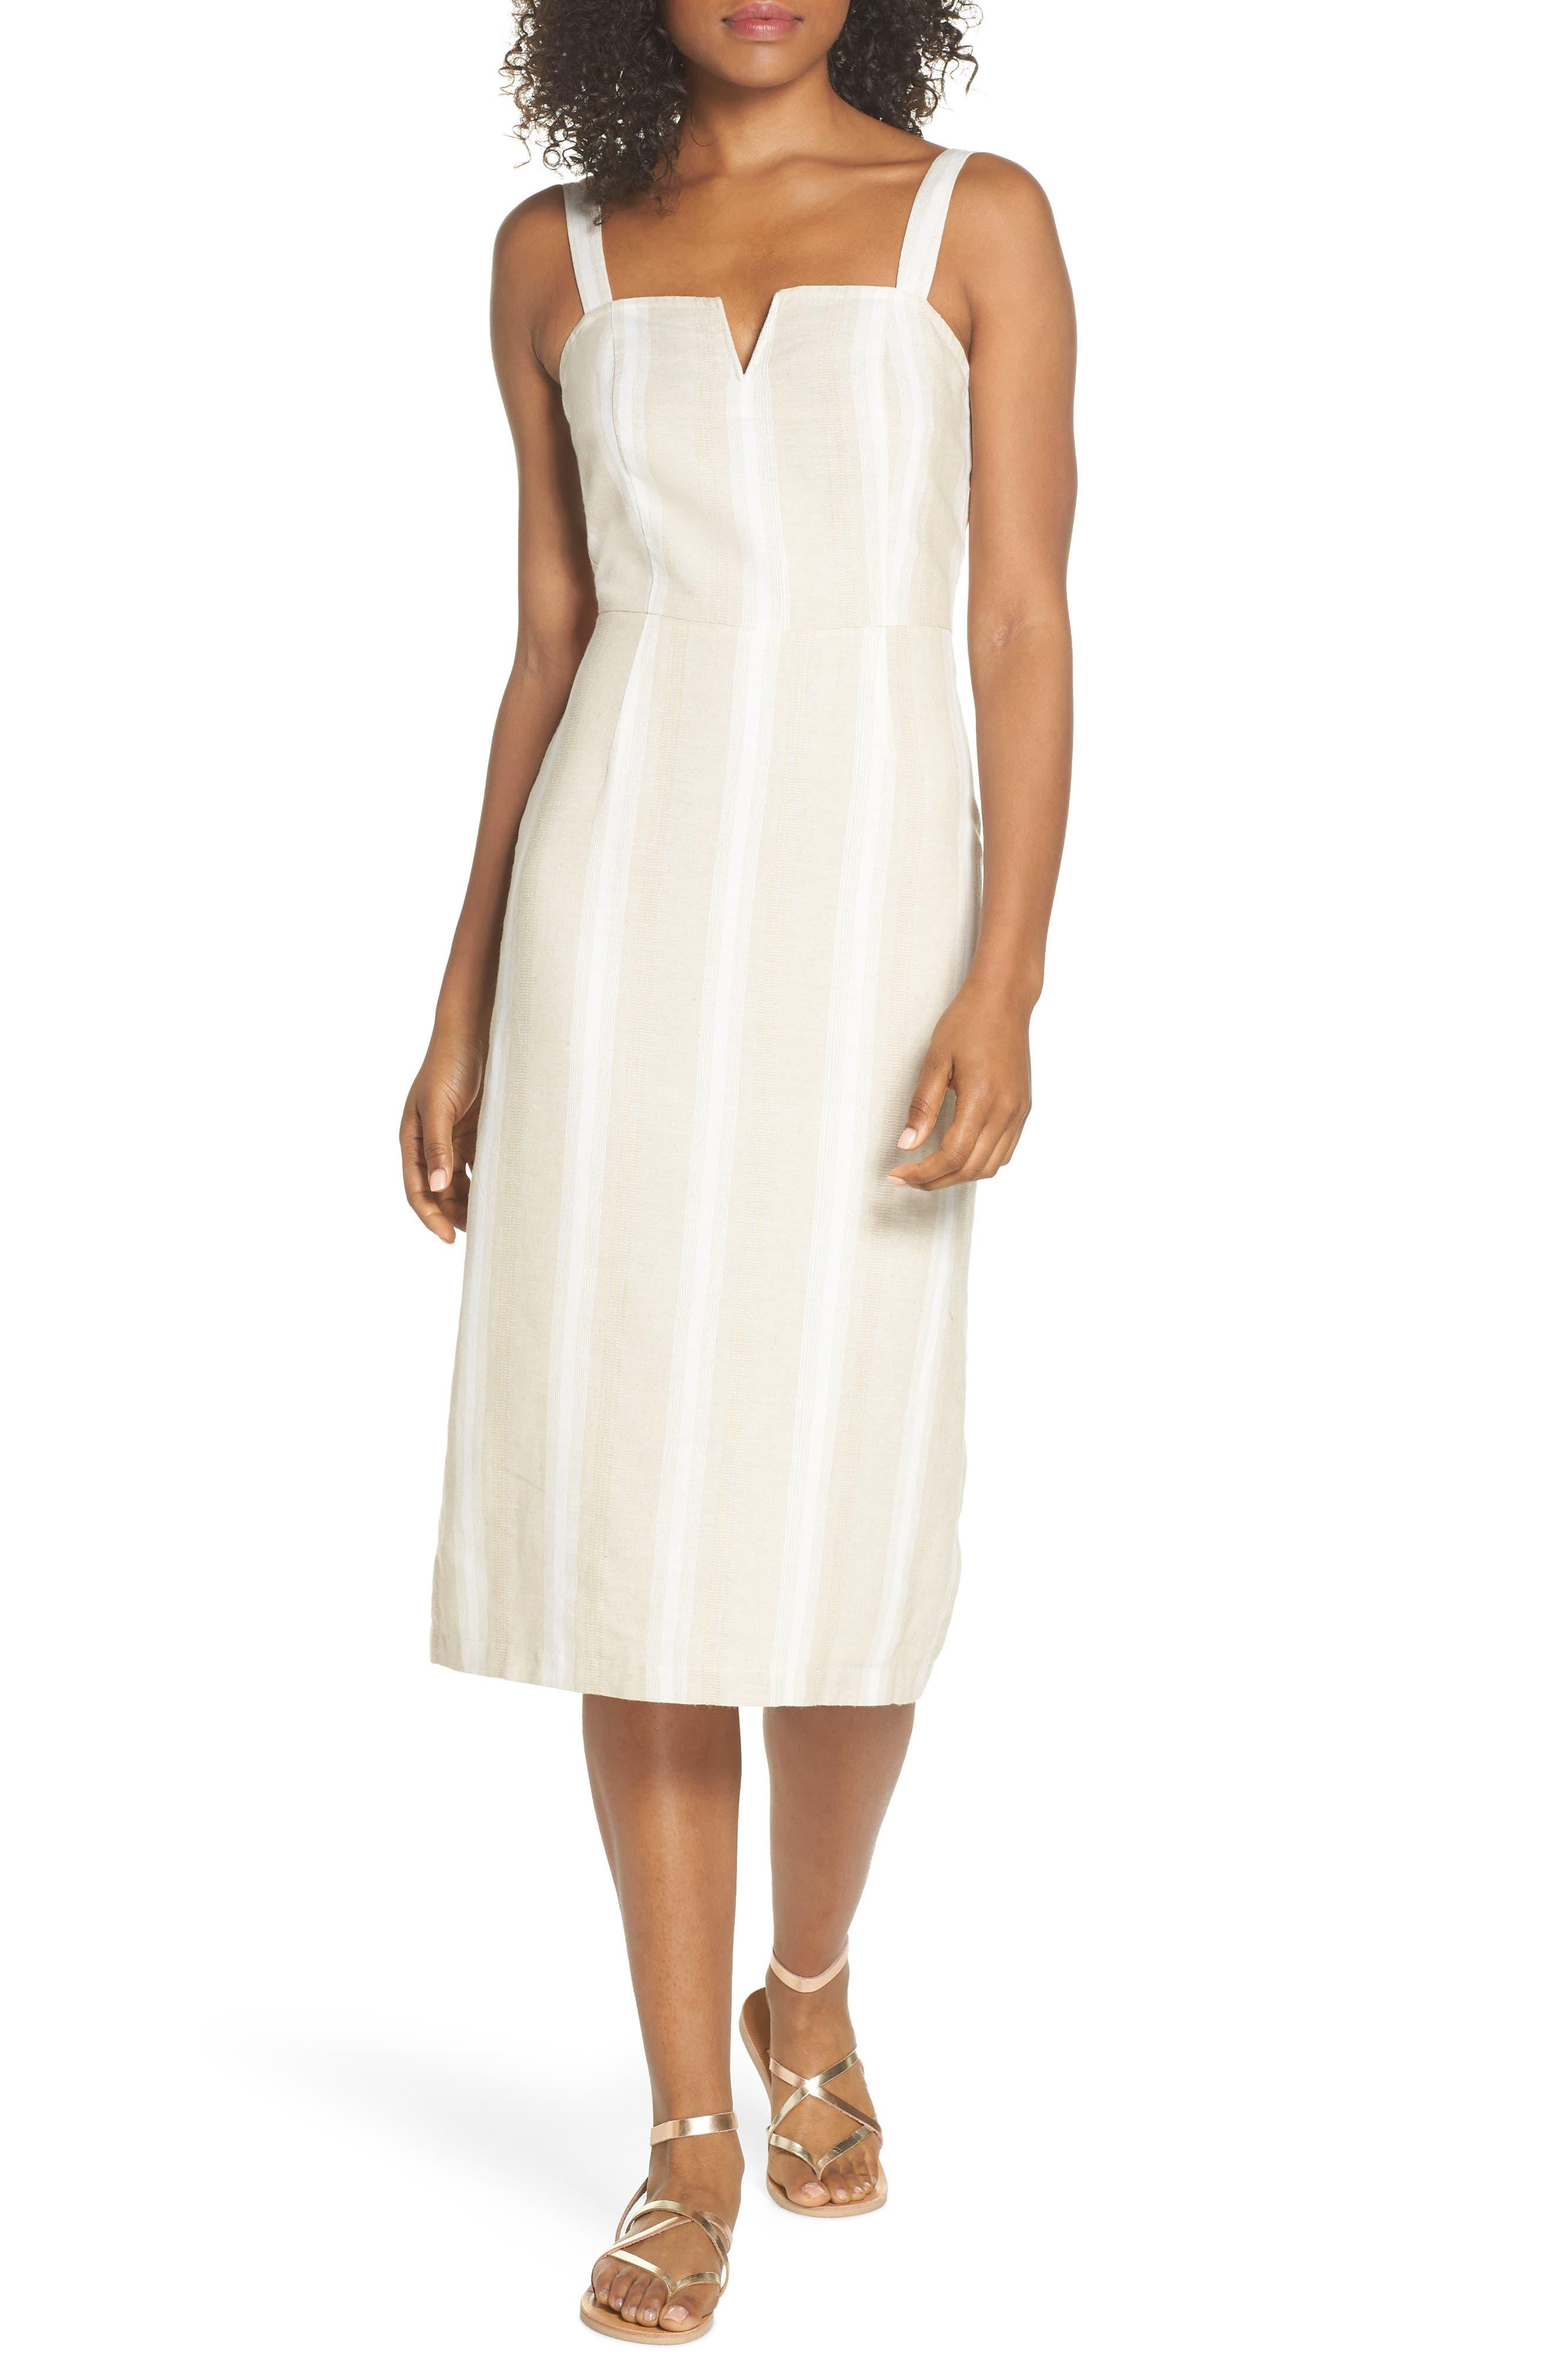 Peekabo Stripe Midi Dress,                         Main,                         color, 250